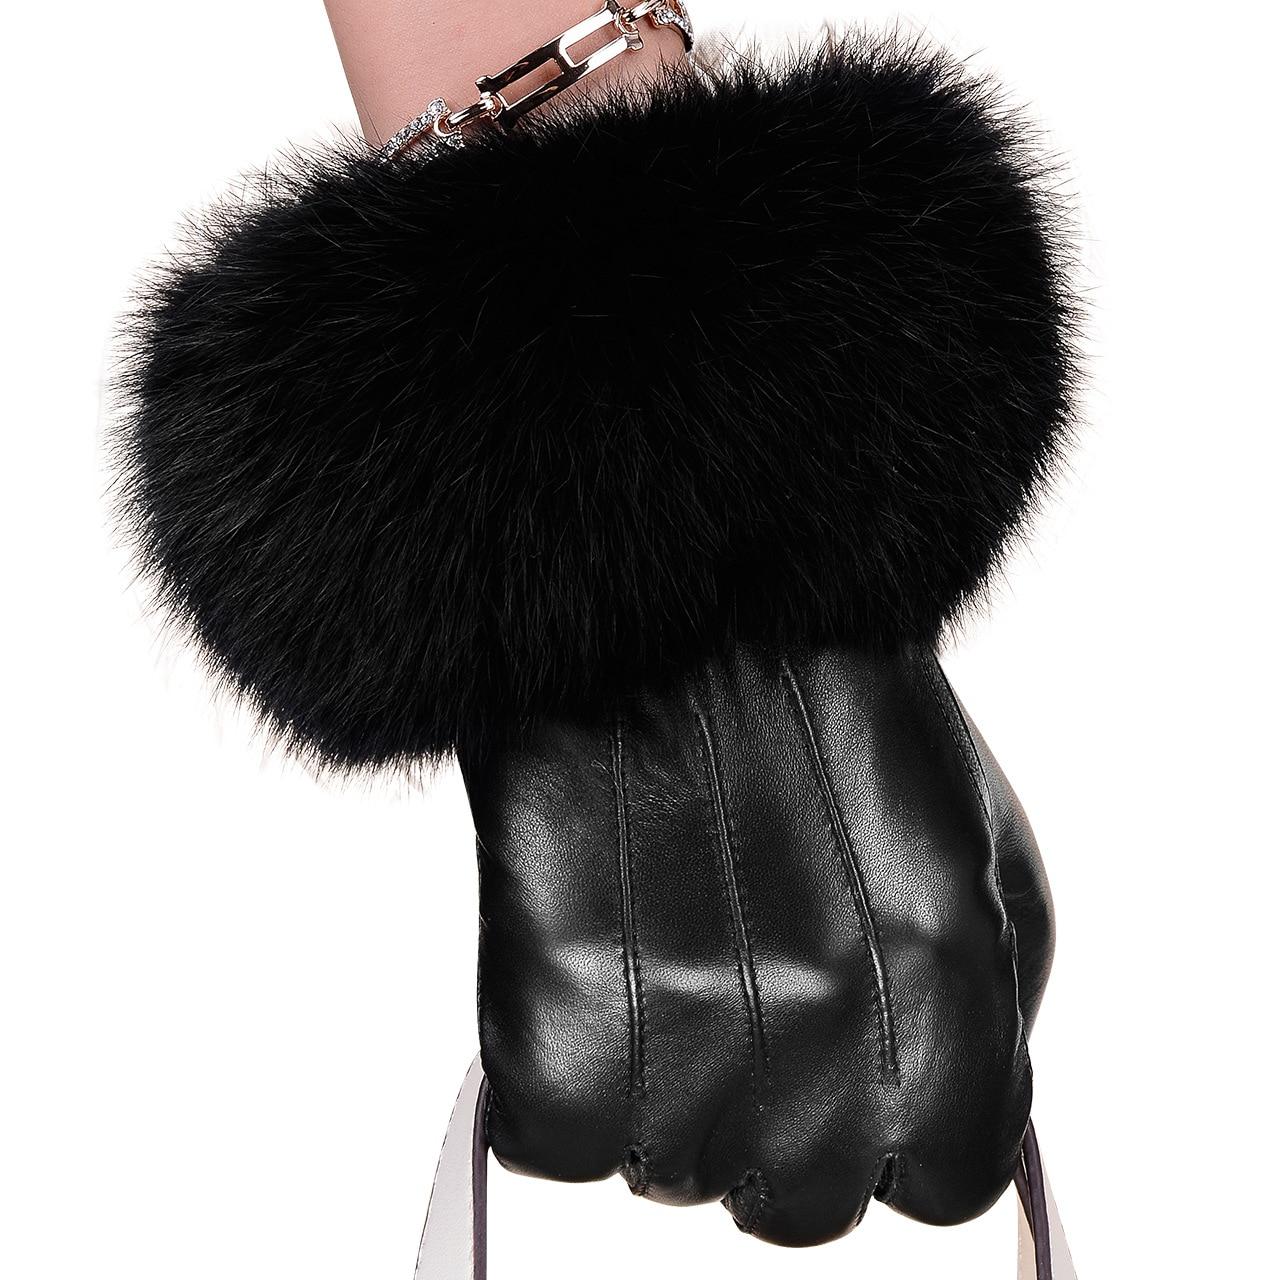 Winter Spring Fashion Winter Sheepskin Gloves Top Lambskin Solid Real Genuine Leather Women Wrist Driving Glove